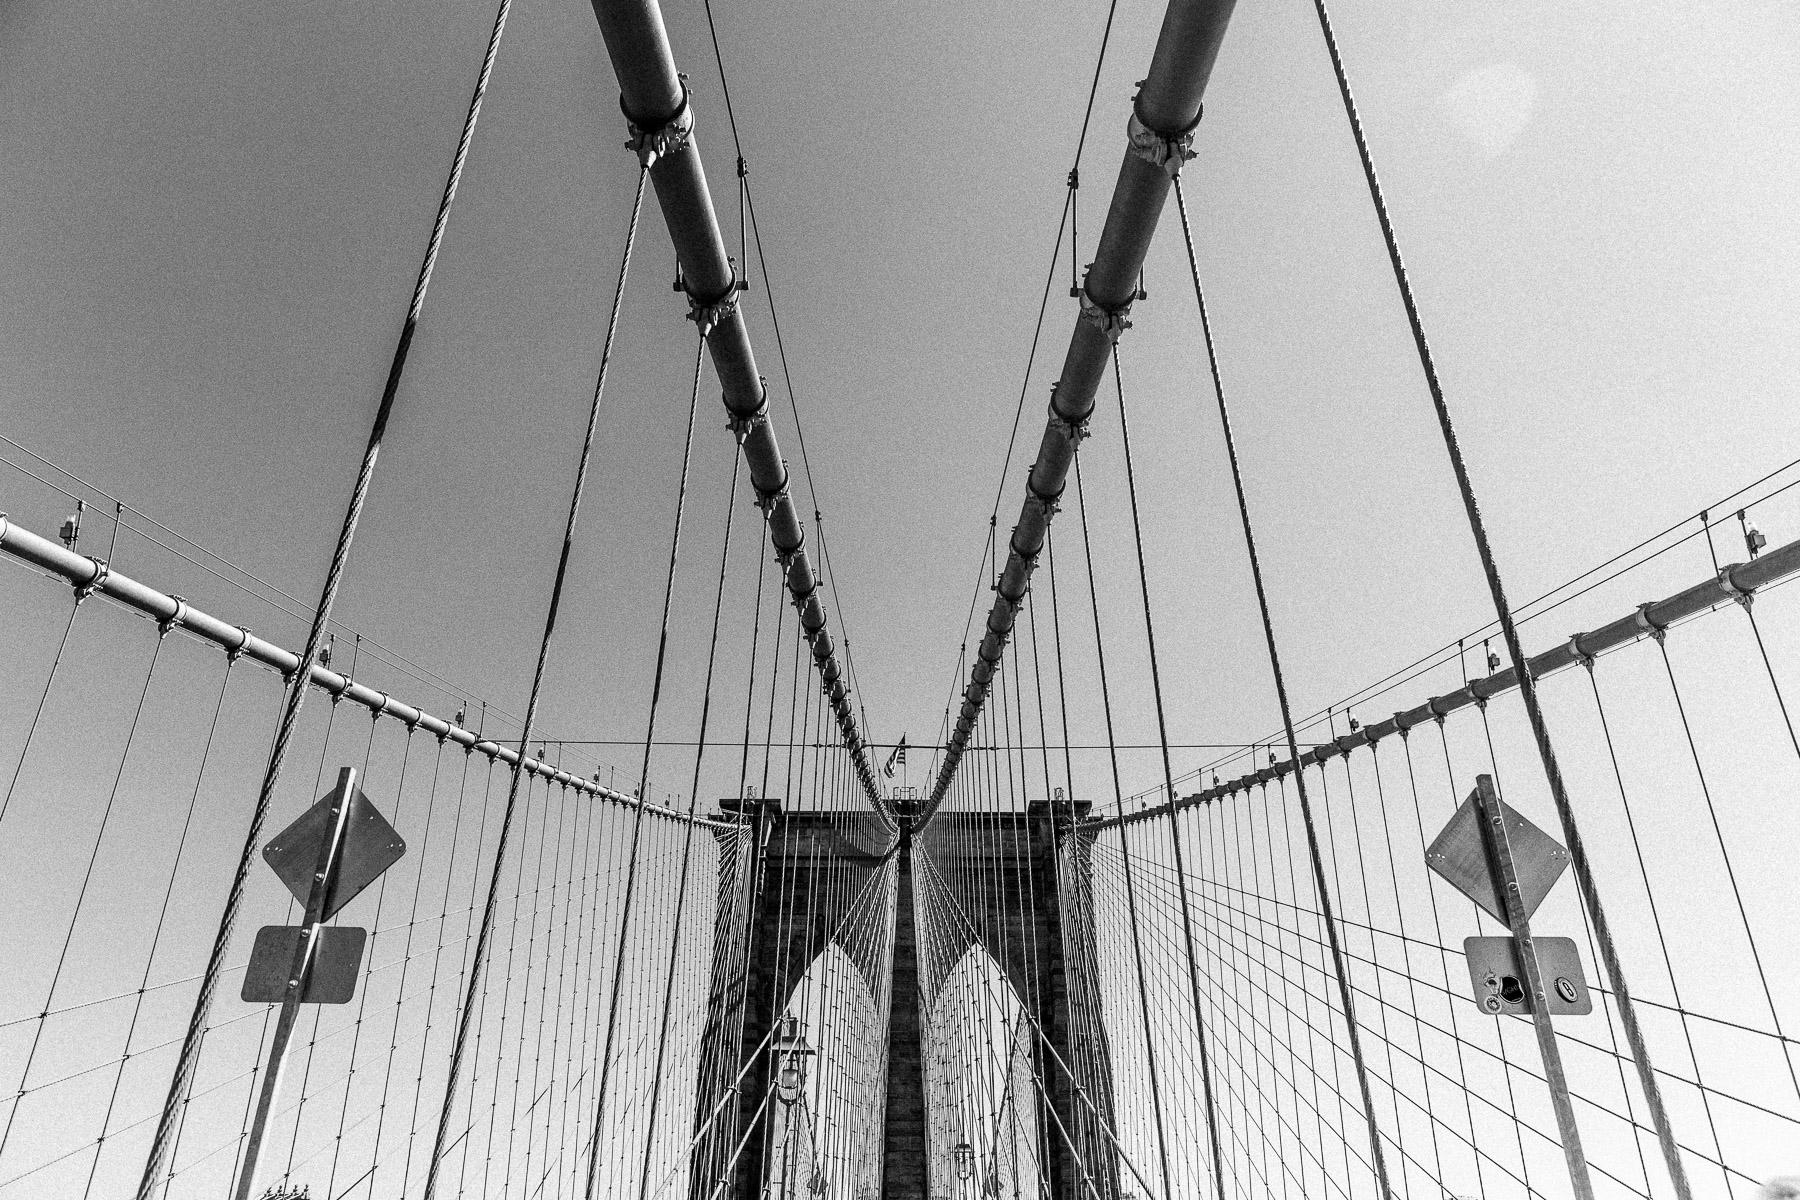 photos-of-brooklyn-bridge-from-underneath.jpg